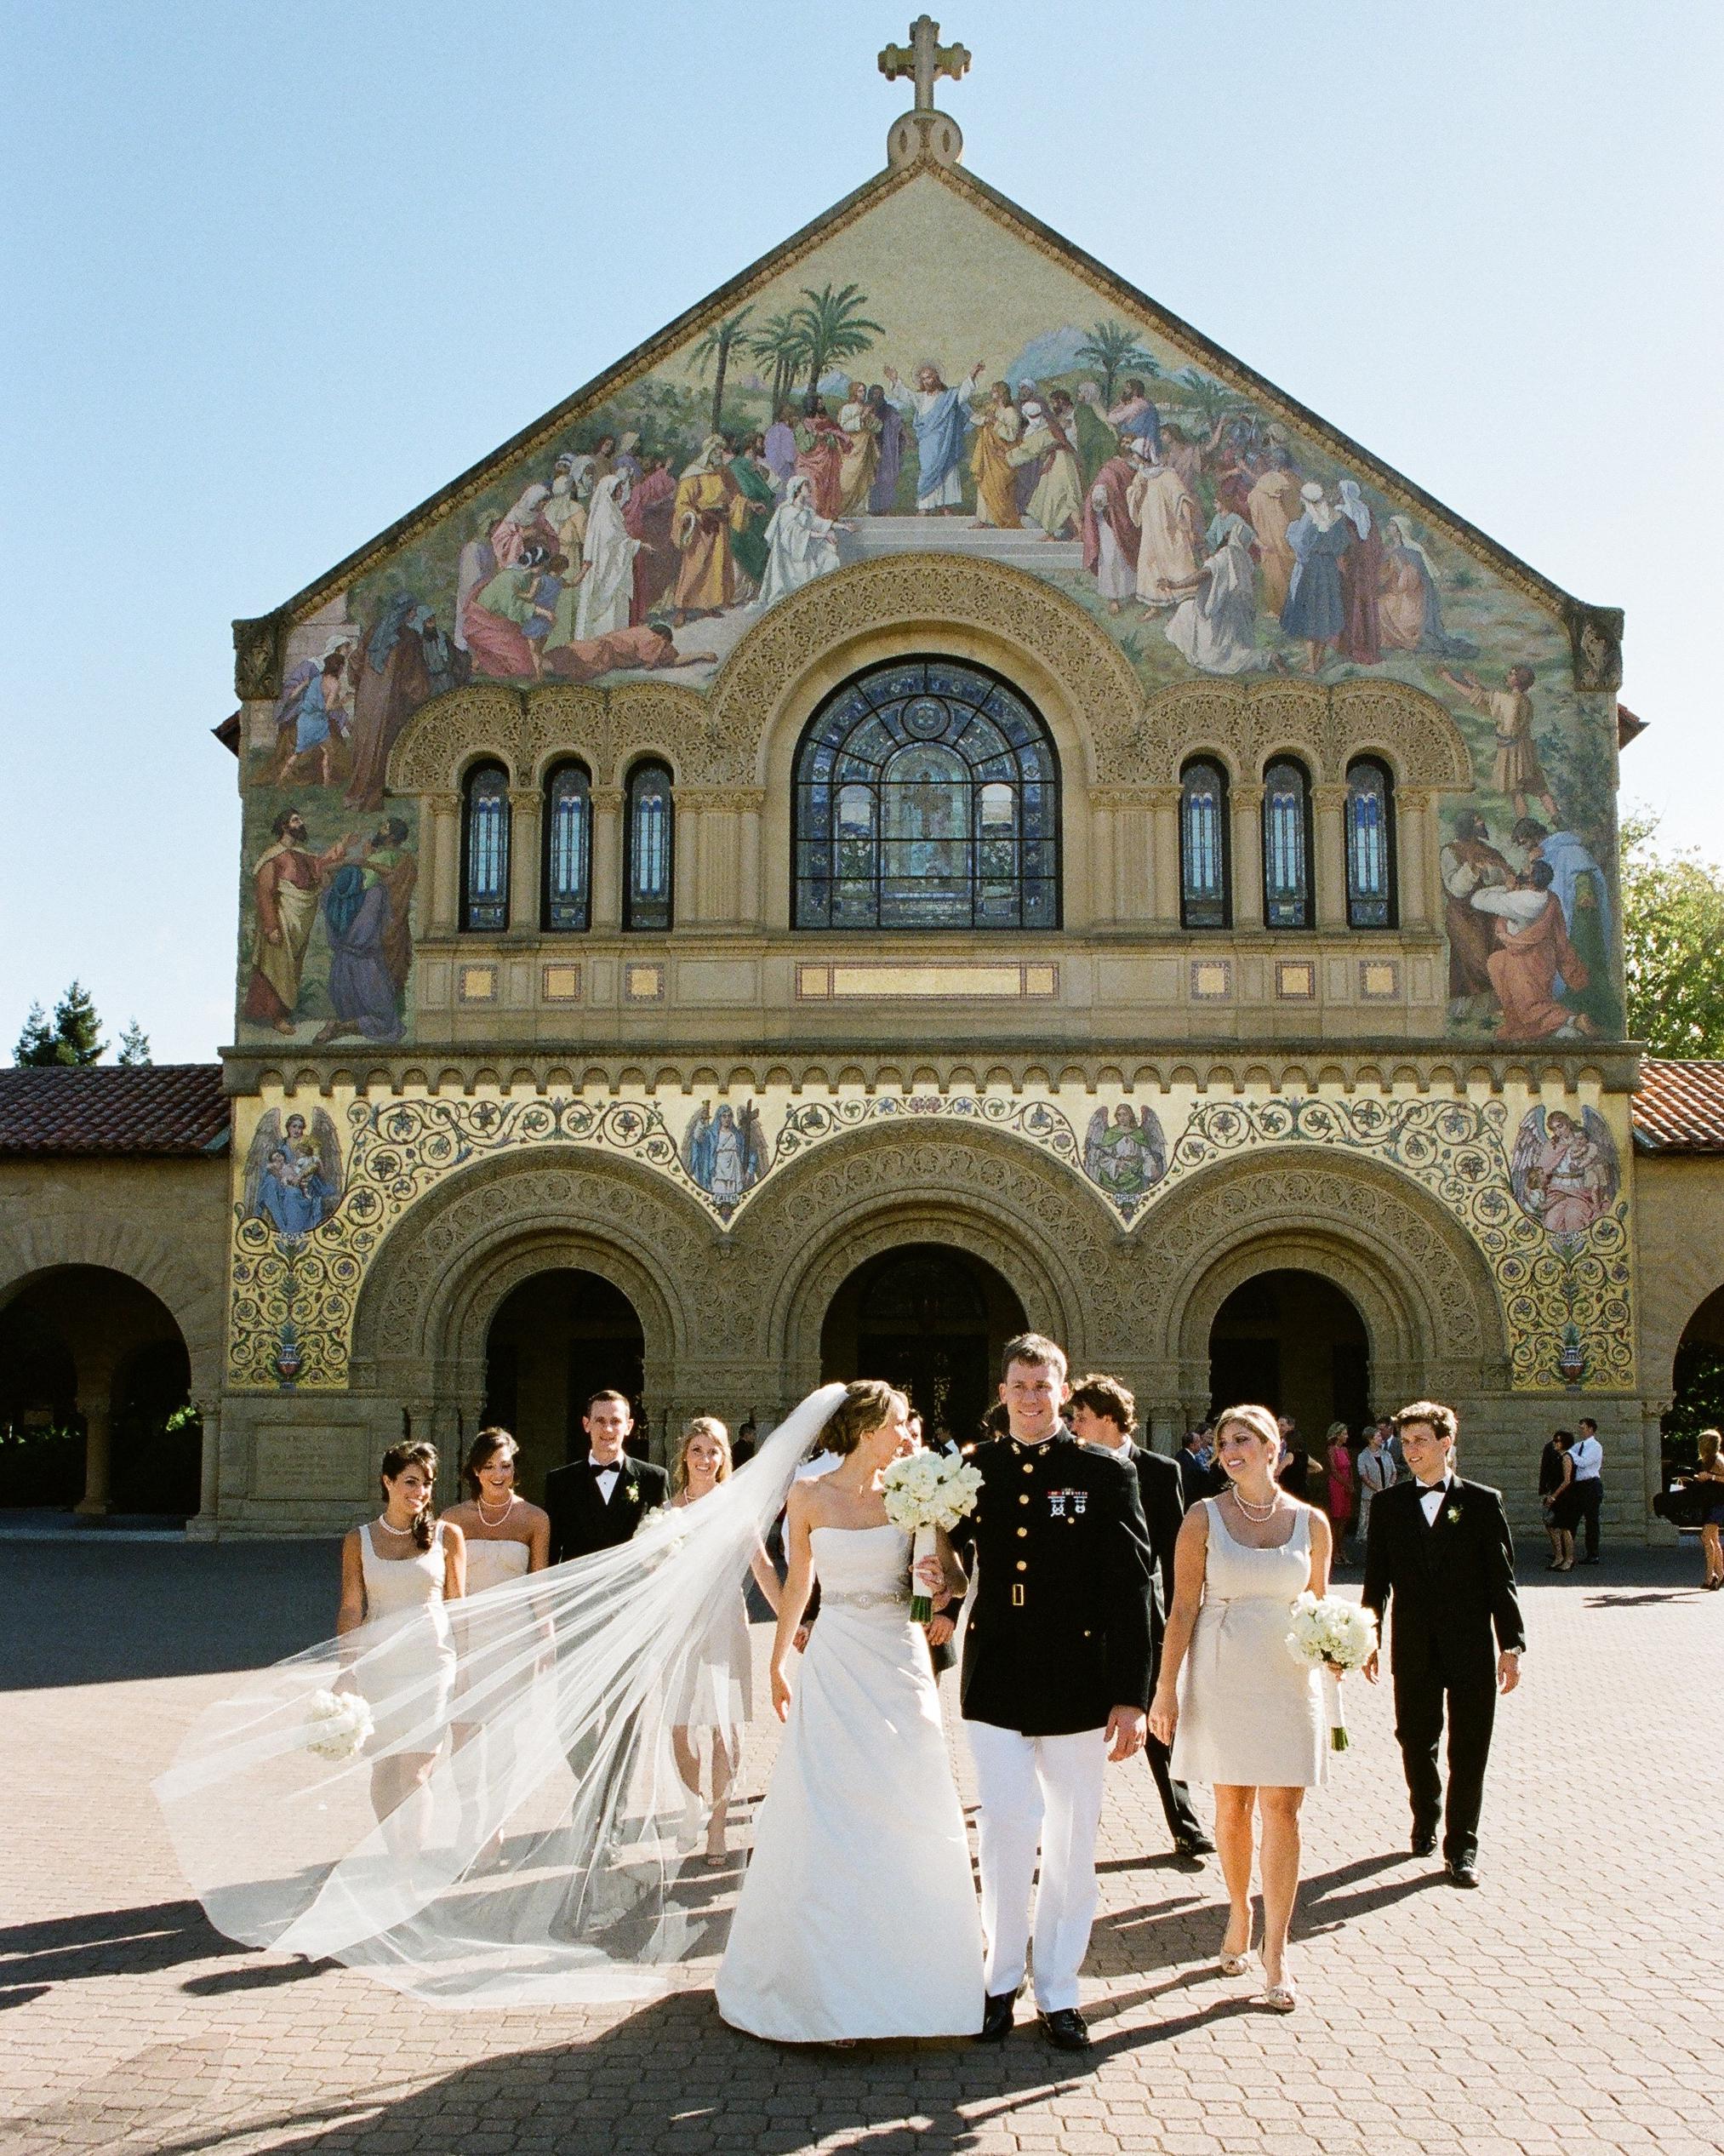 collegeweddingvenues-stanford-exterior-0615.jpg